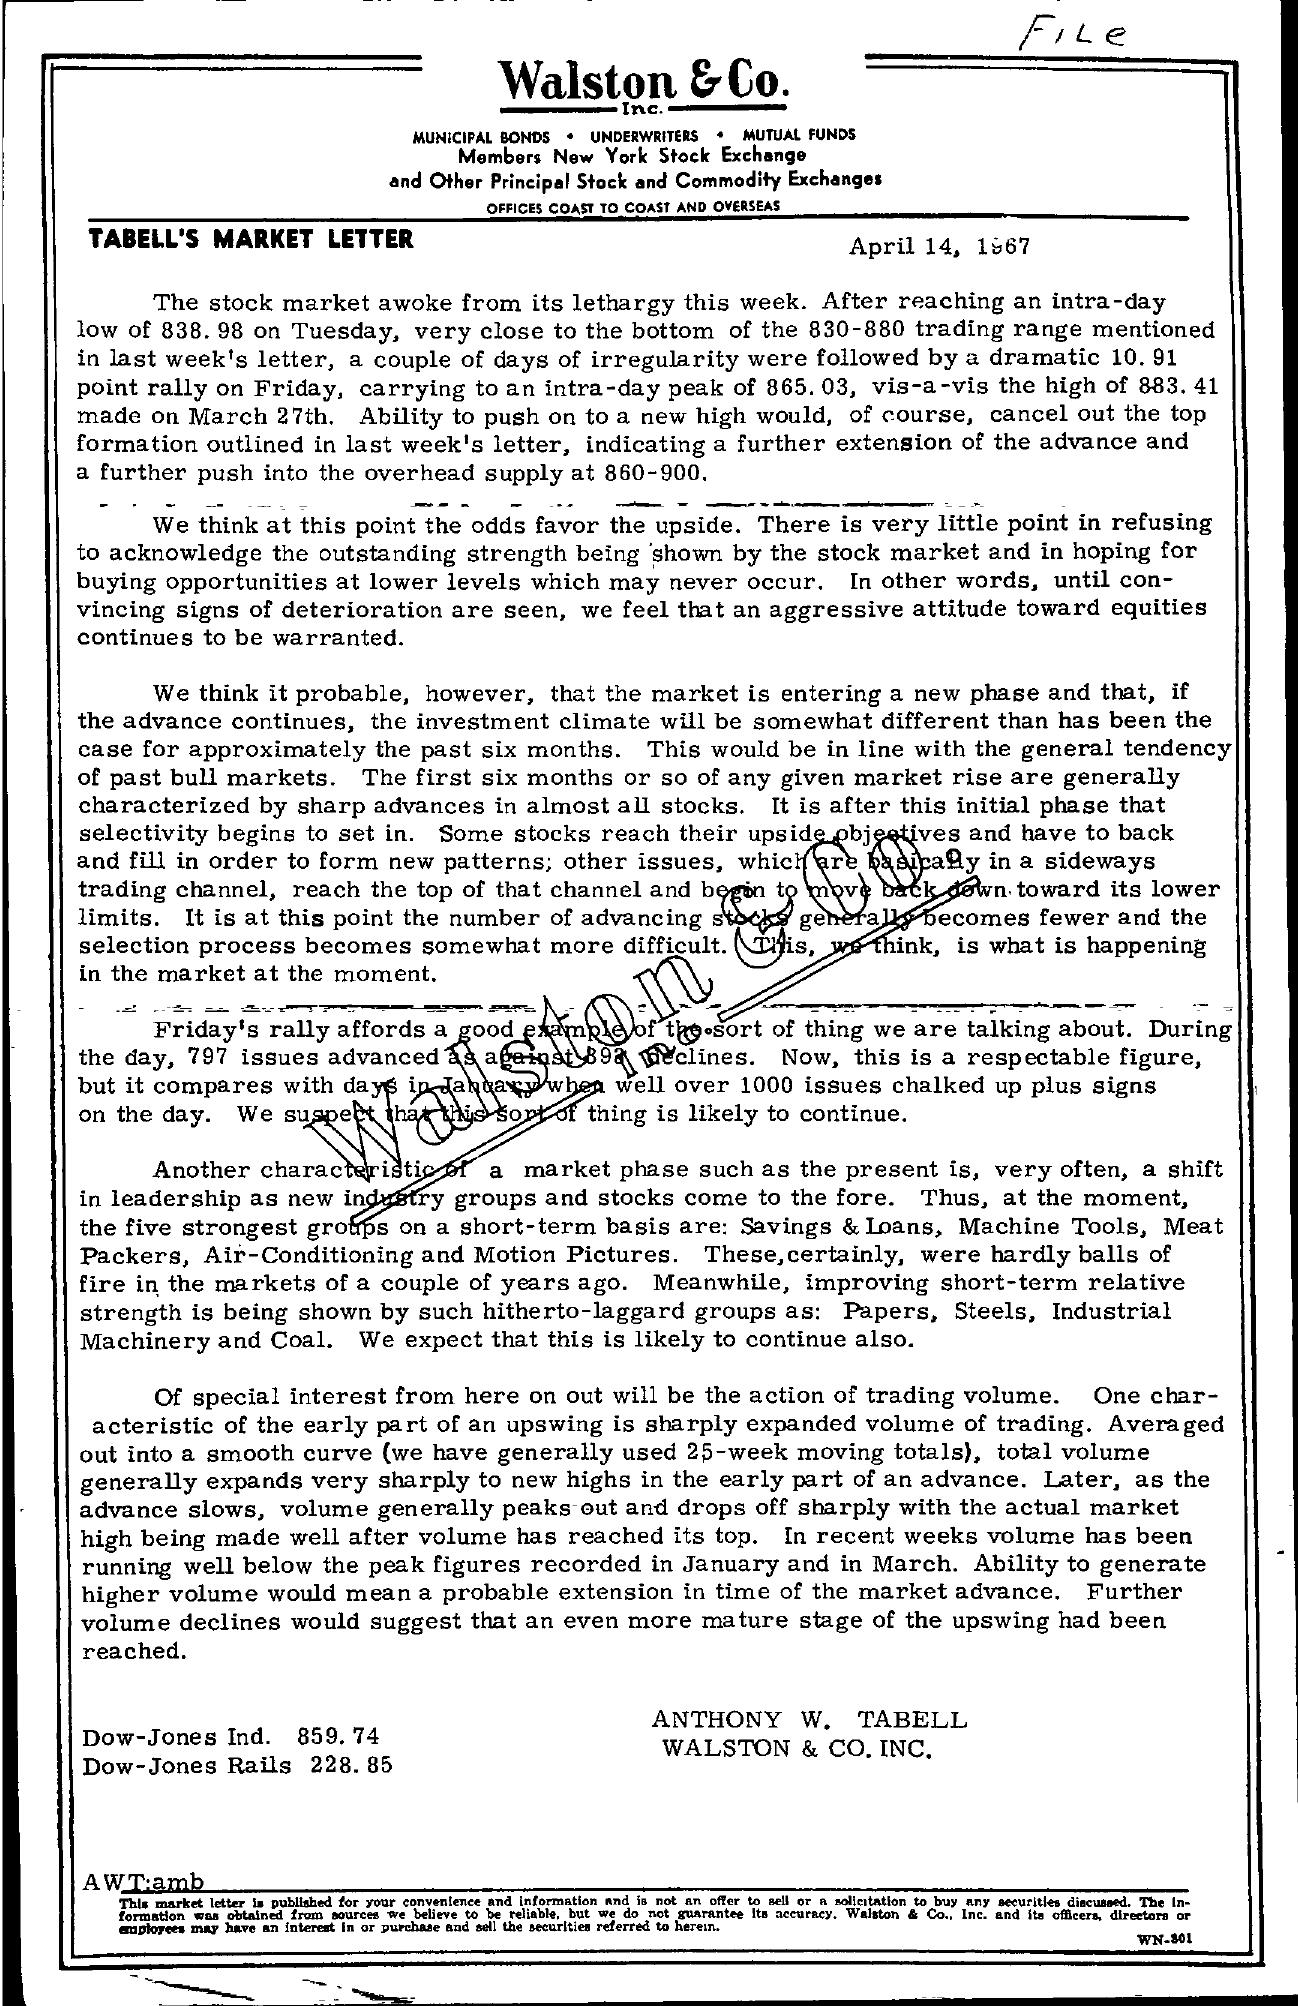 Tabell's Market Letter - April 14, 1967